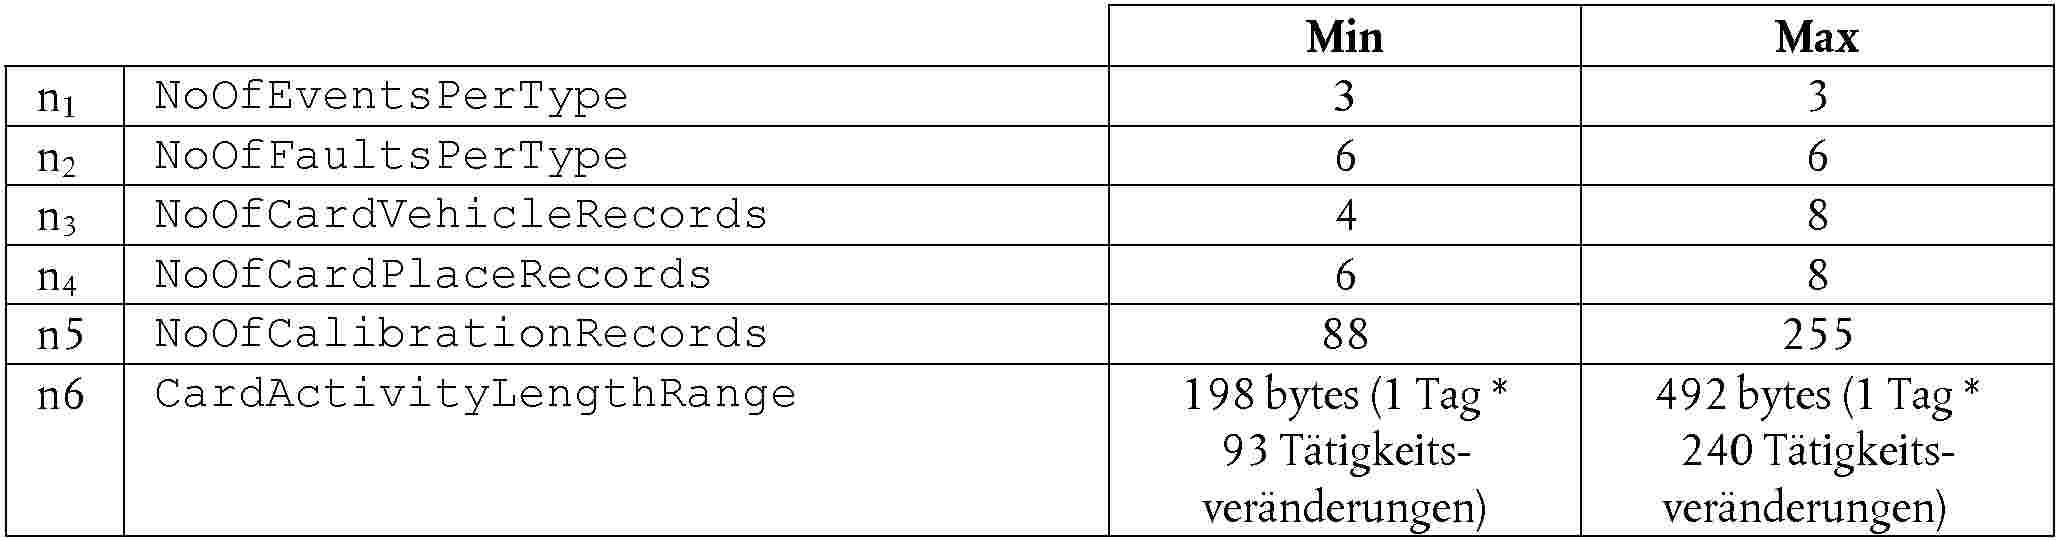 EUR-Lex - 01985R3821-20111001 - EN - EUR-Lex